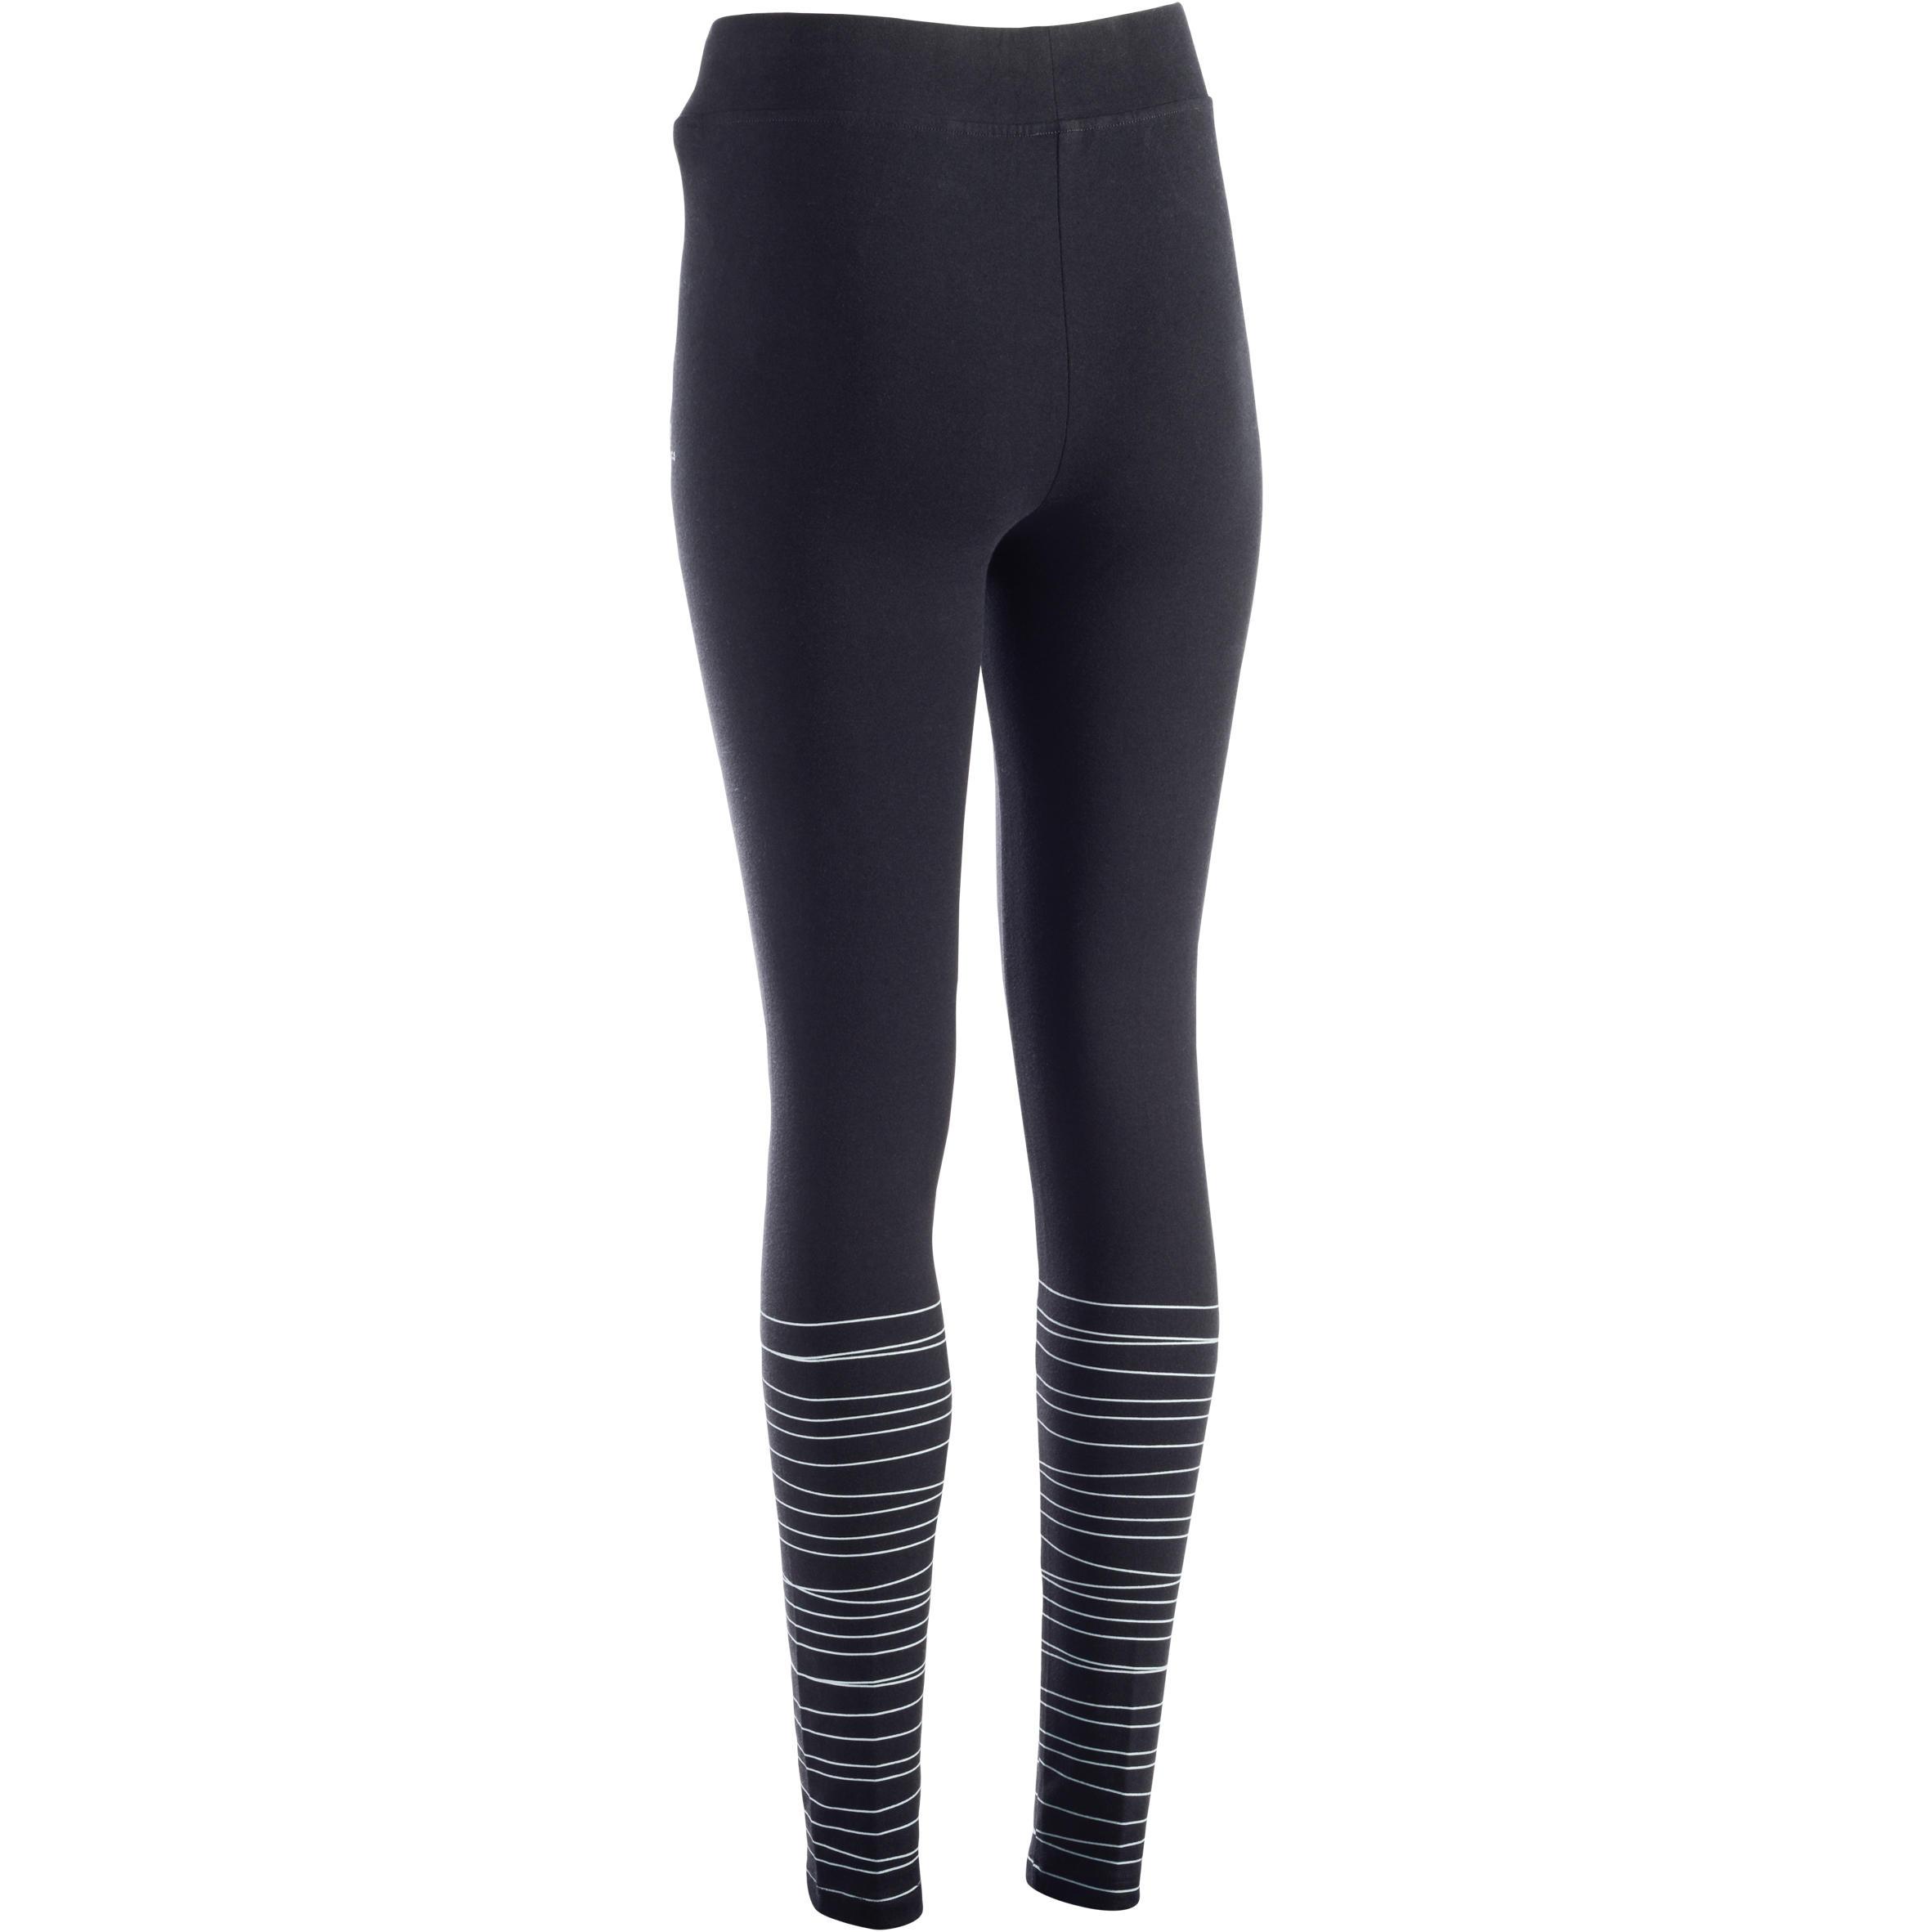 Fit+ 500 Women's Slim-Fit Gym & Pilates Leggings - Black Print with Blue Lines